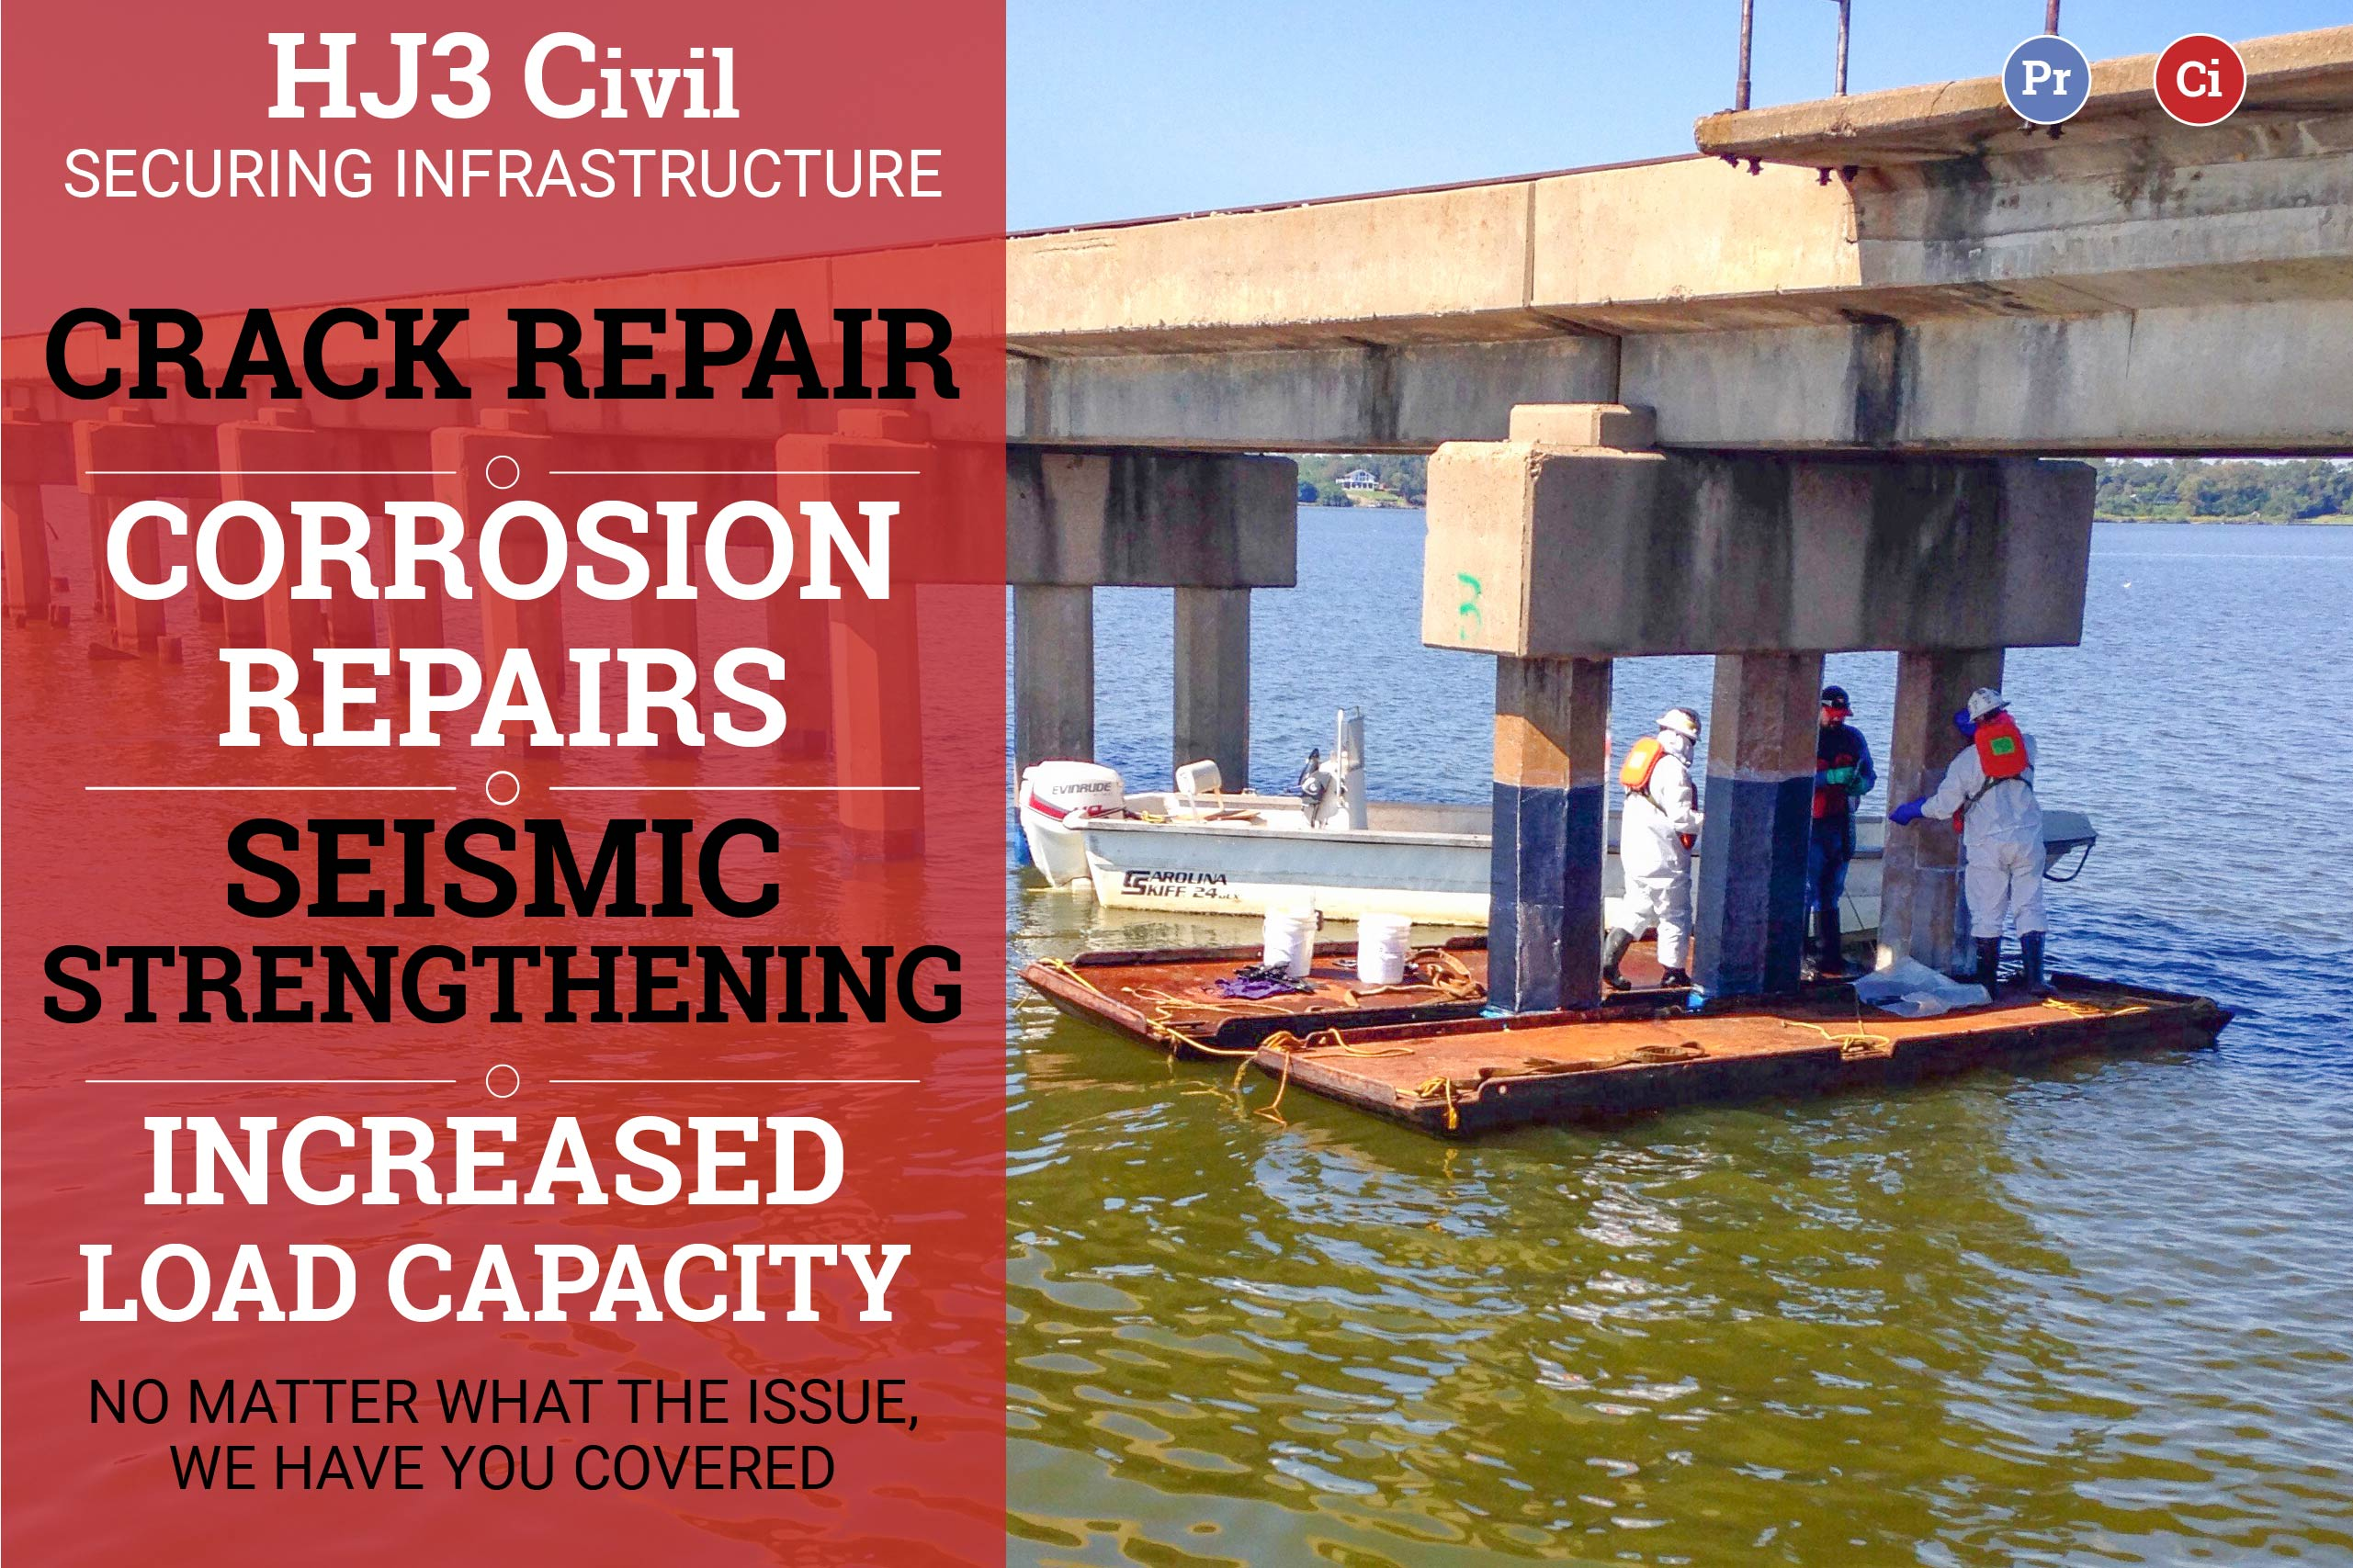 HJ3 Civil Infrastructure repair